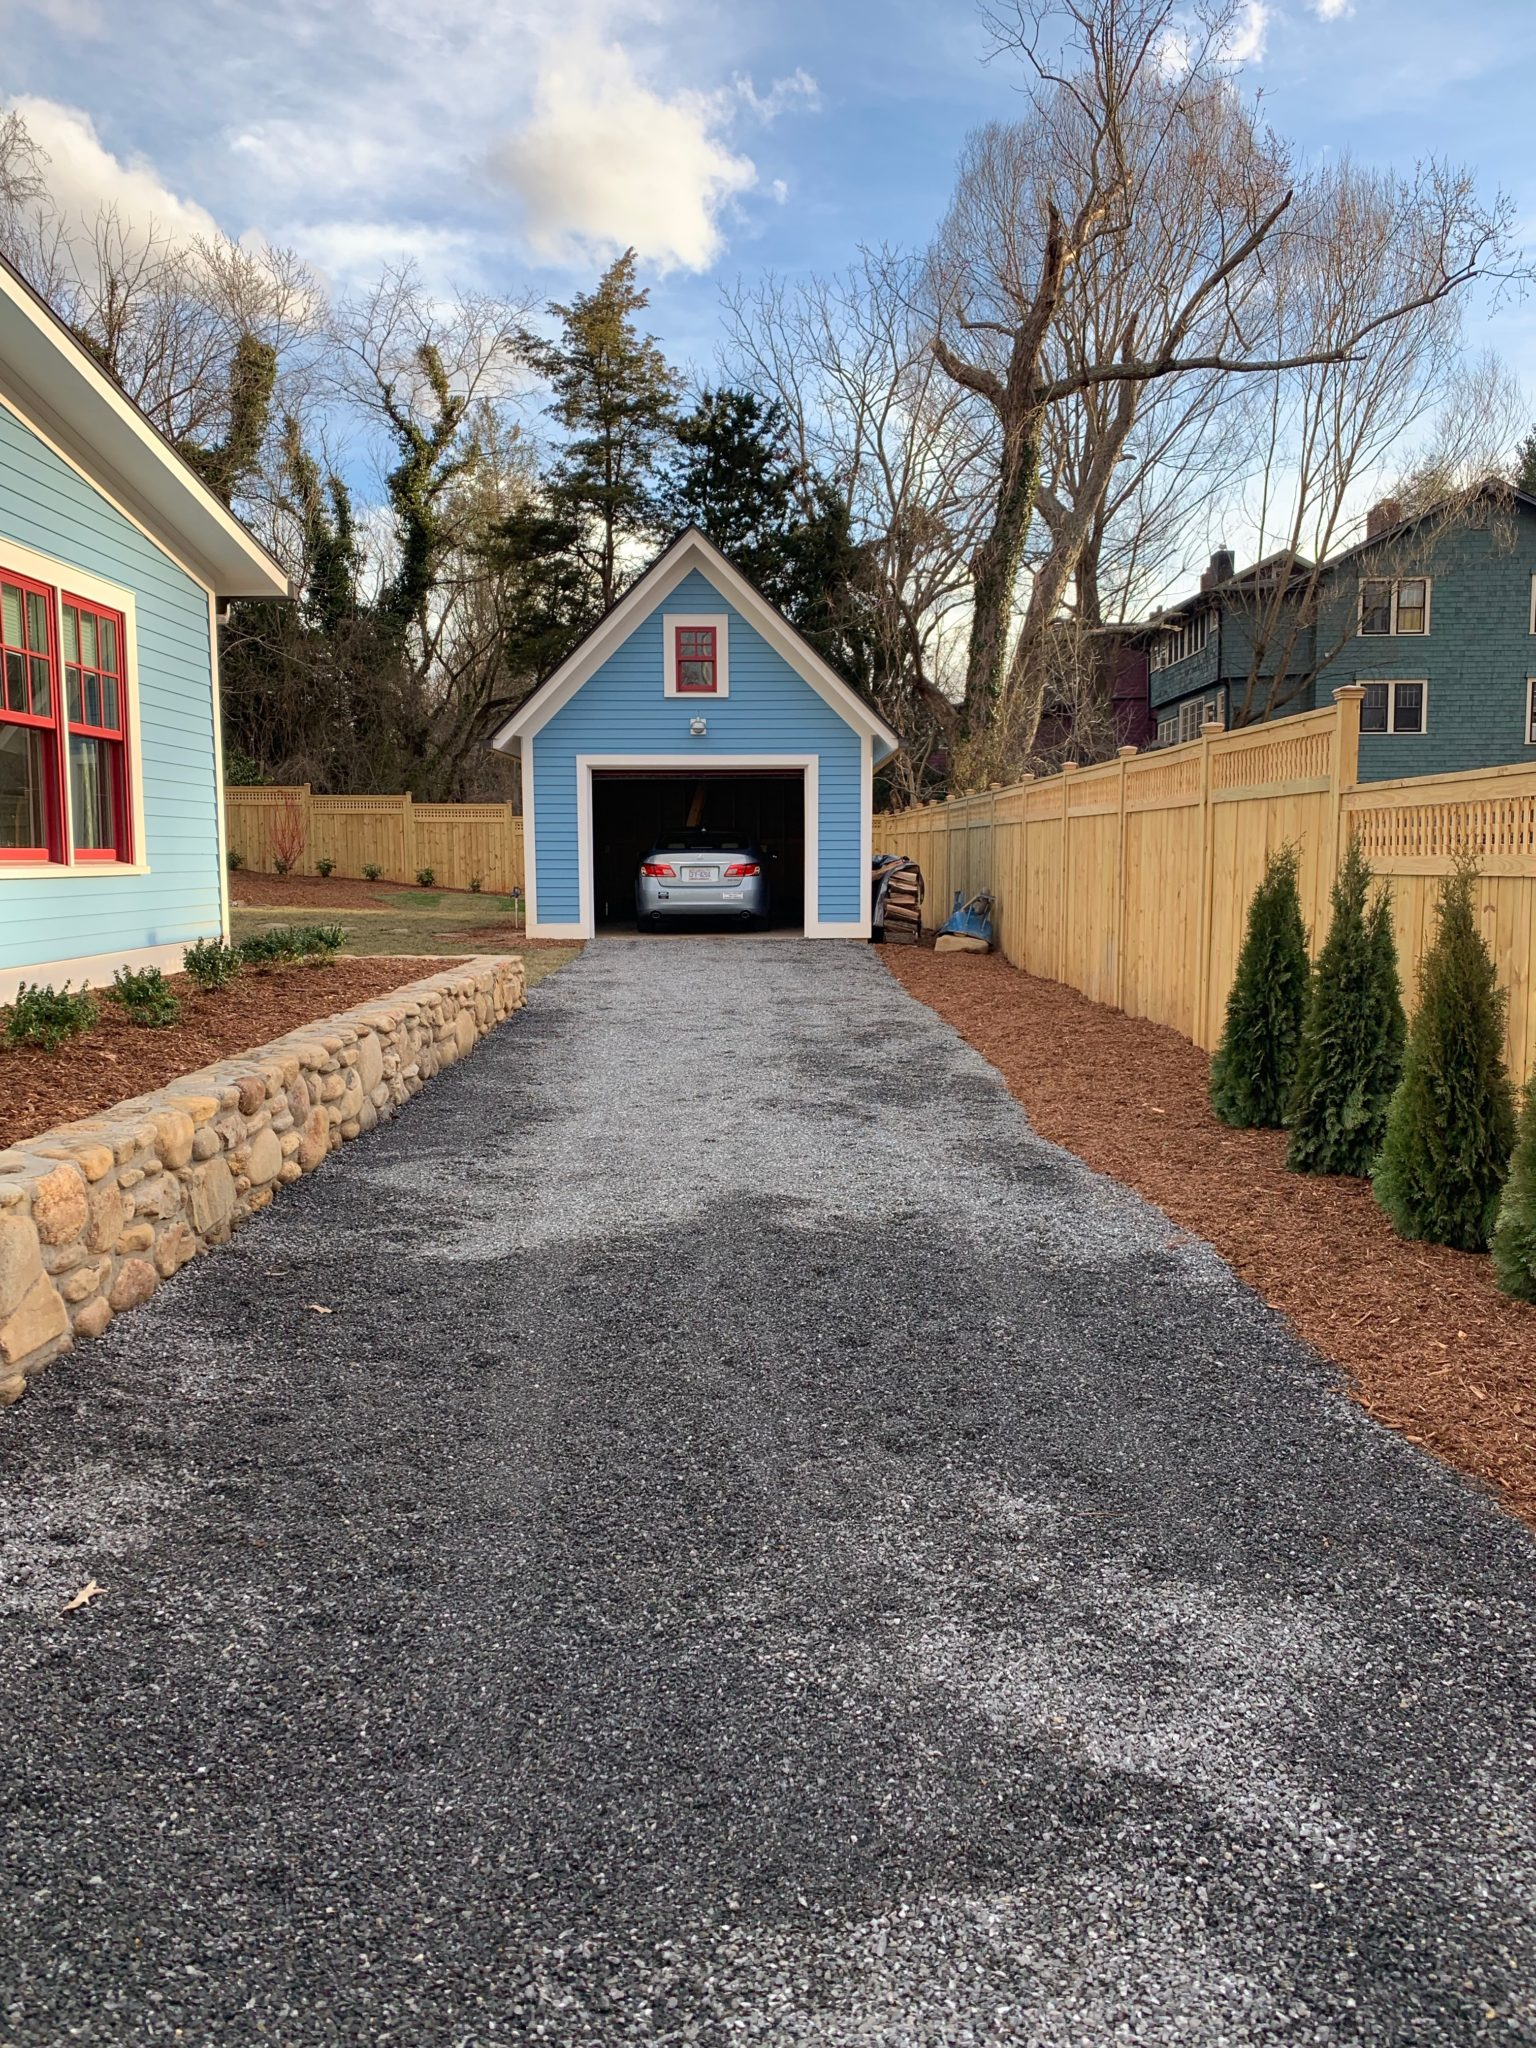 Blue garage with car